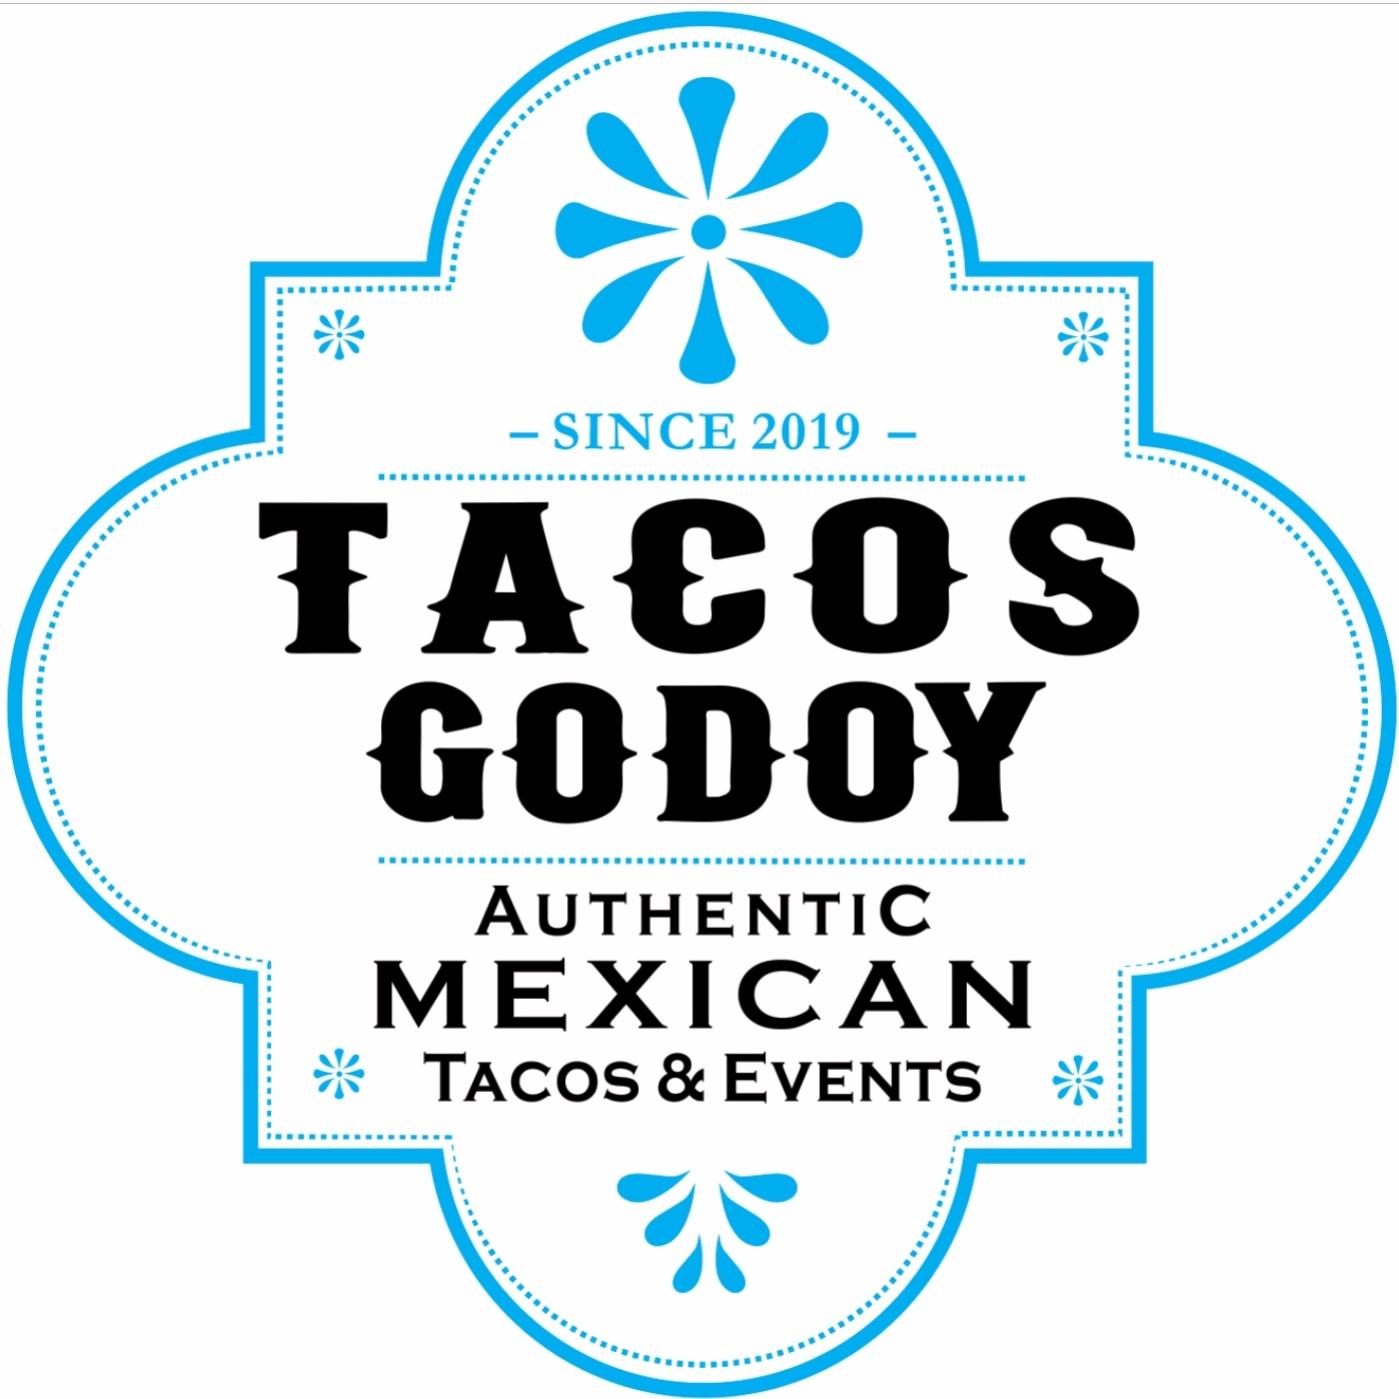 Tacos Godoy food truck profile image